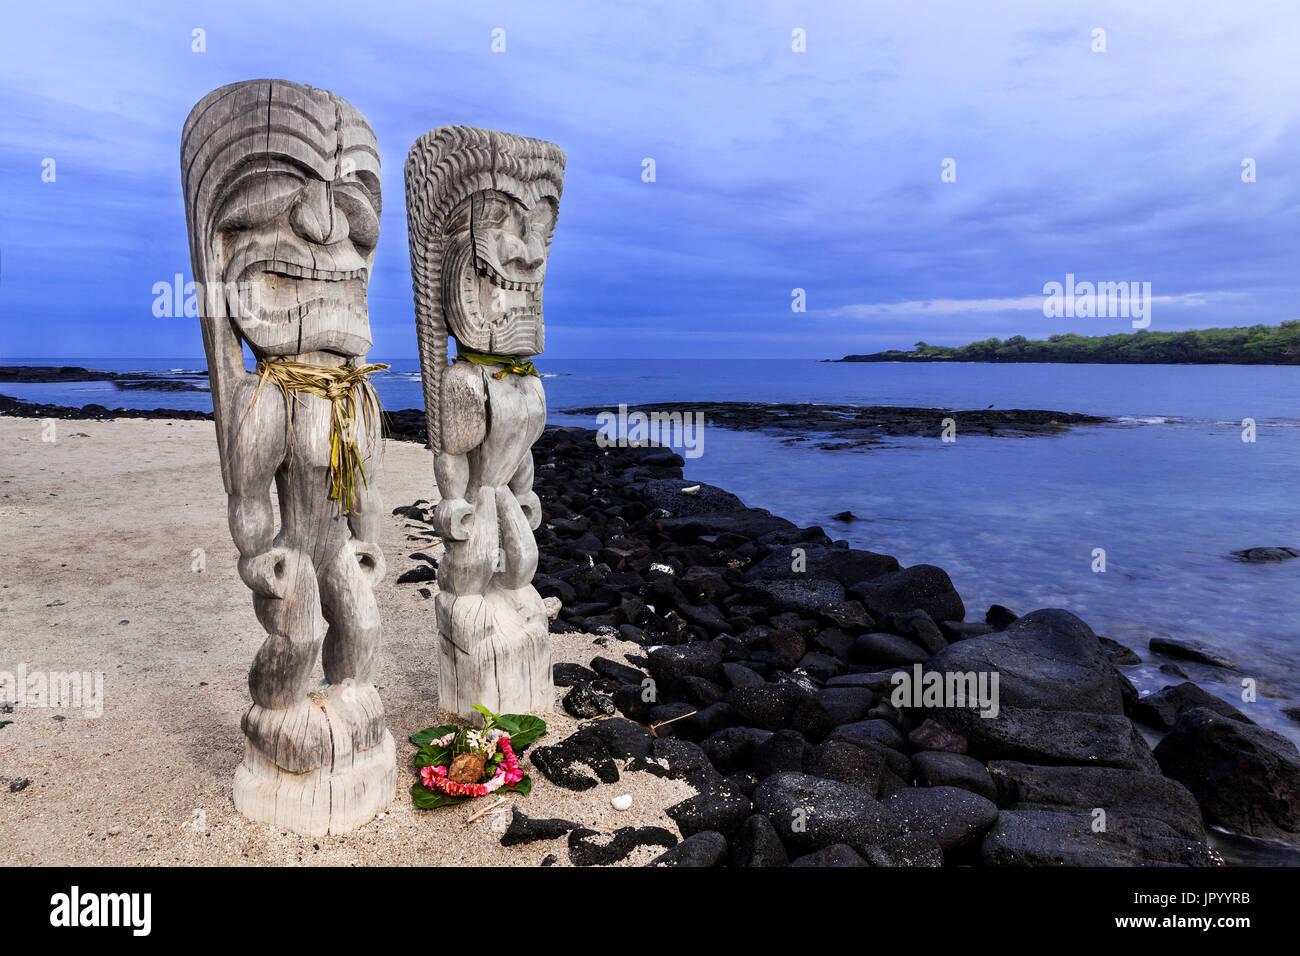 HI00233-00...HAWAI'I - Hale o Keawe (Ki'i) wooden images standing watch on the shore of  Honaunau Bay in Pu'uhonua Stock Photo